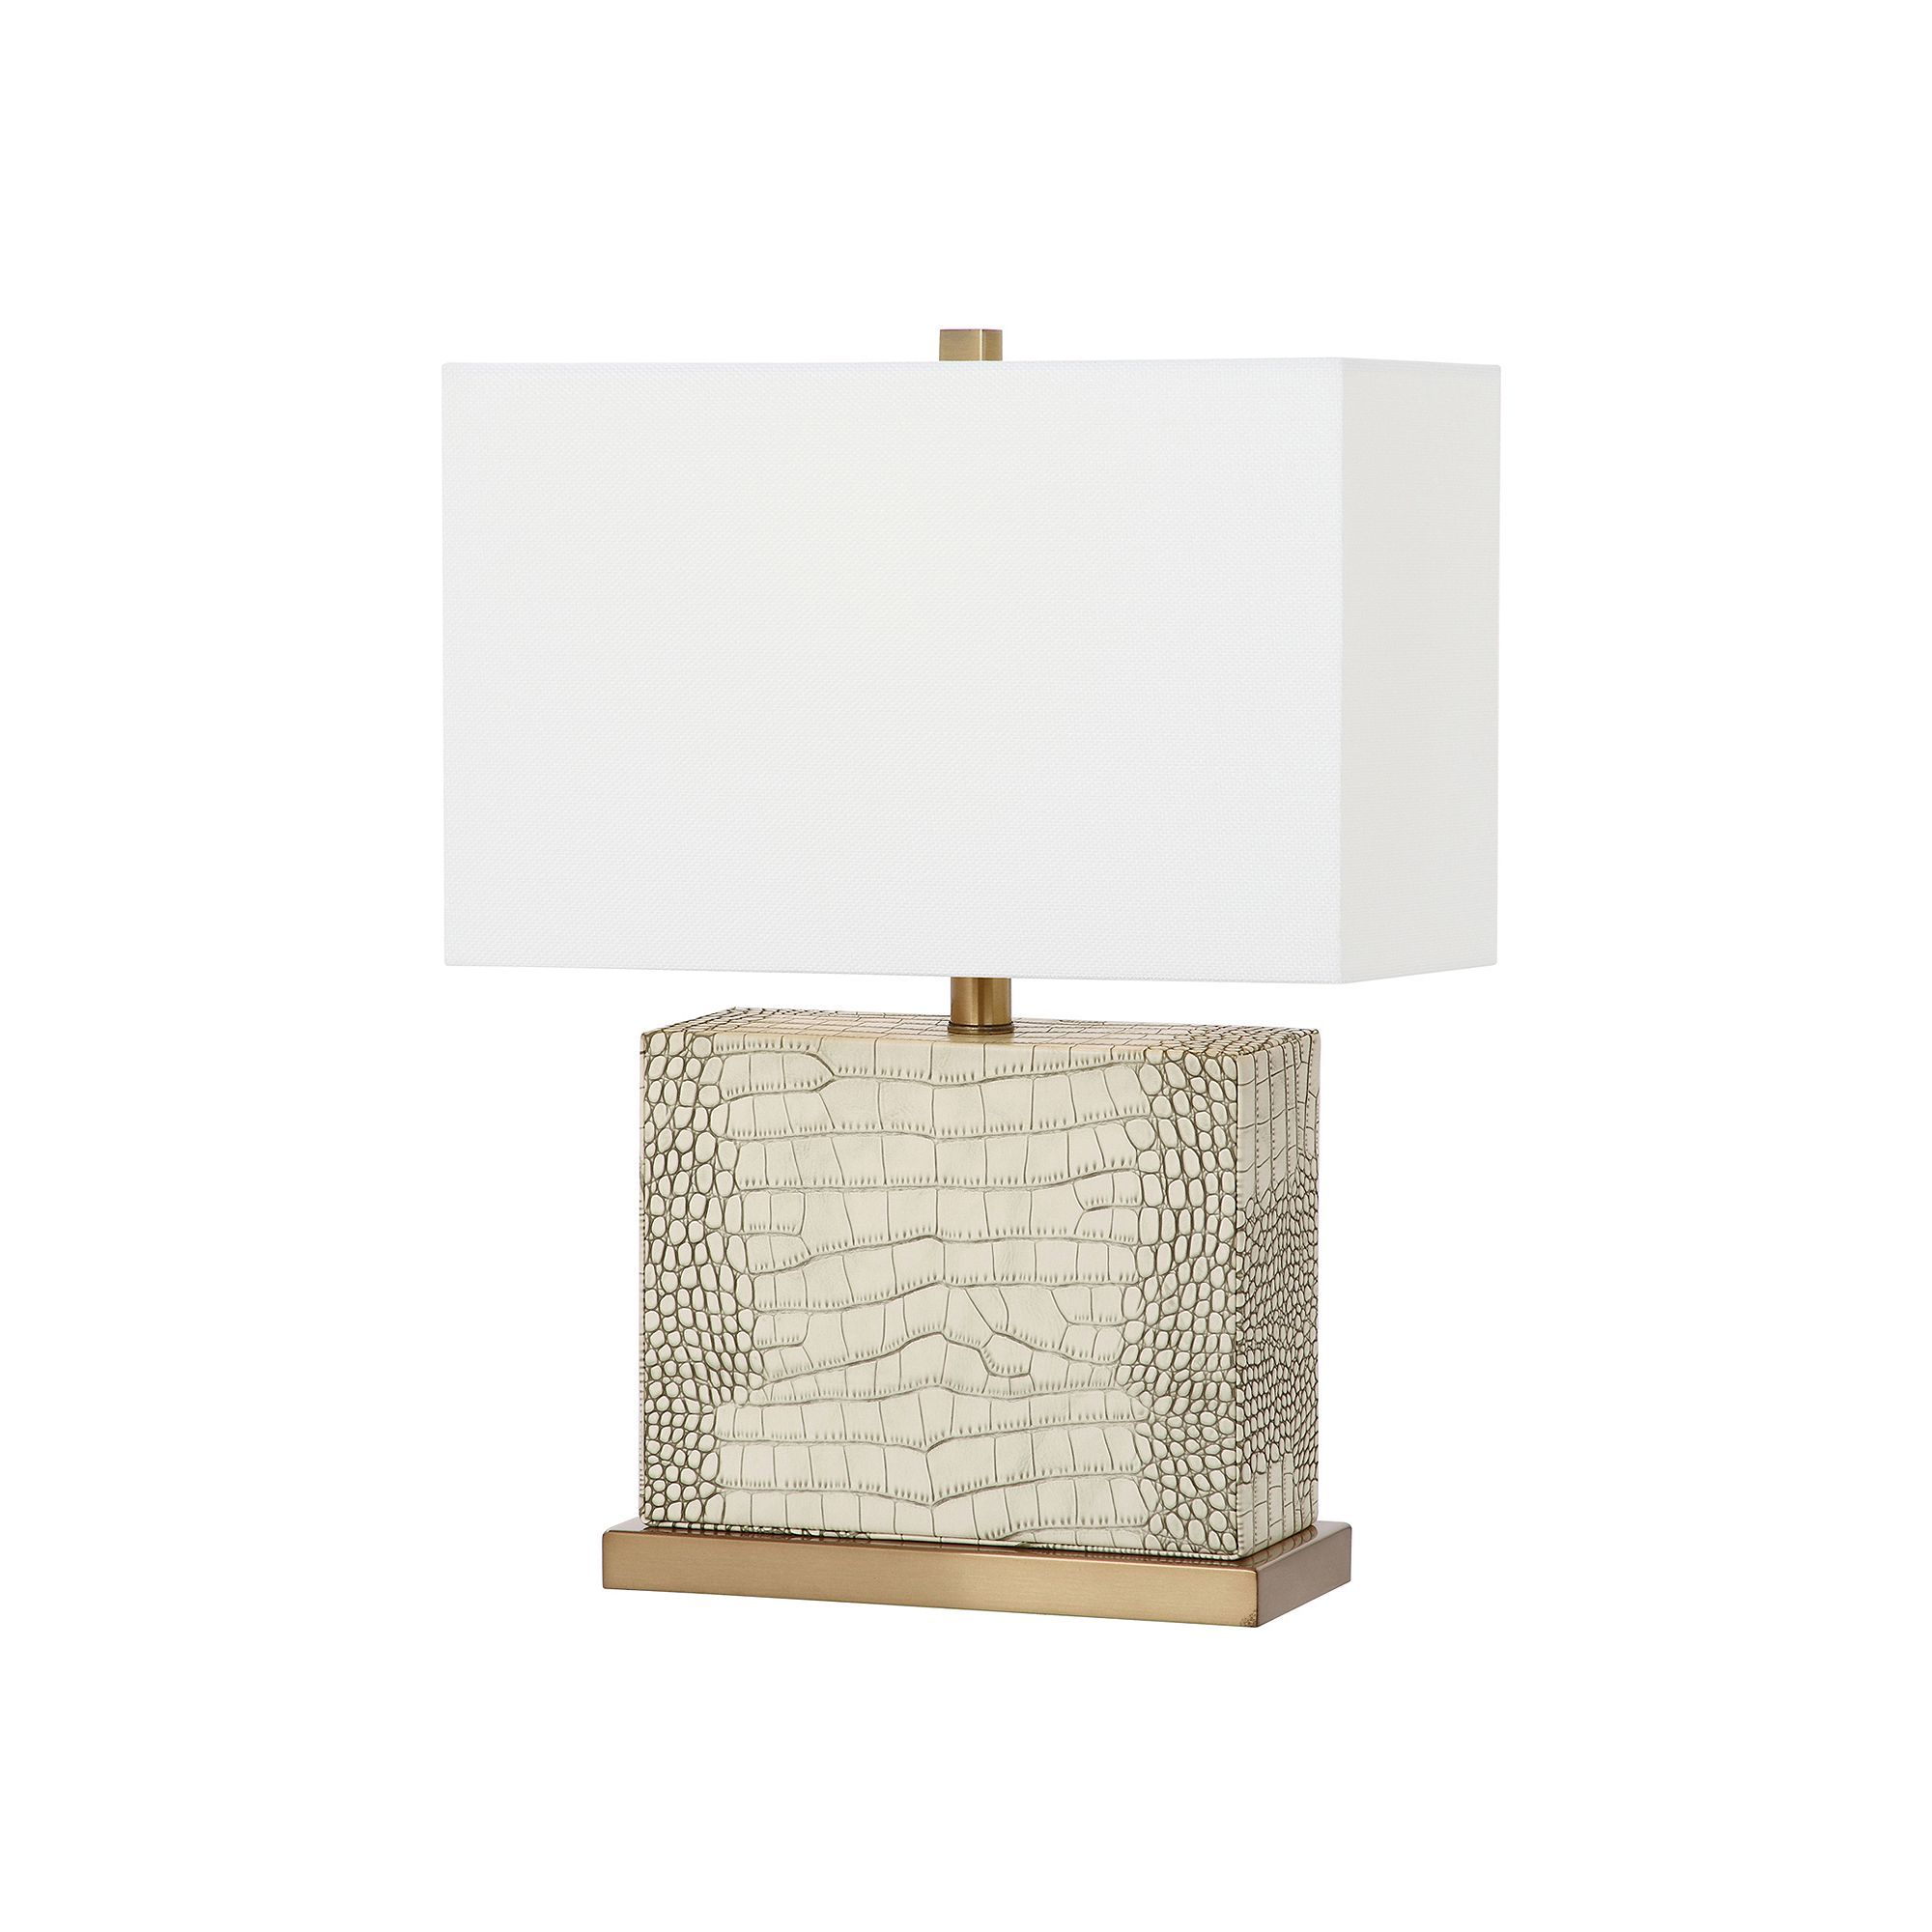 Safavieh Deliah Faux Alligator Table Lamp, White Oth